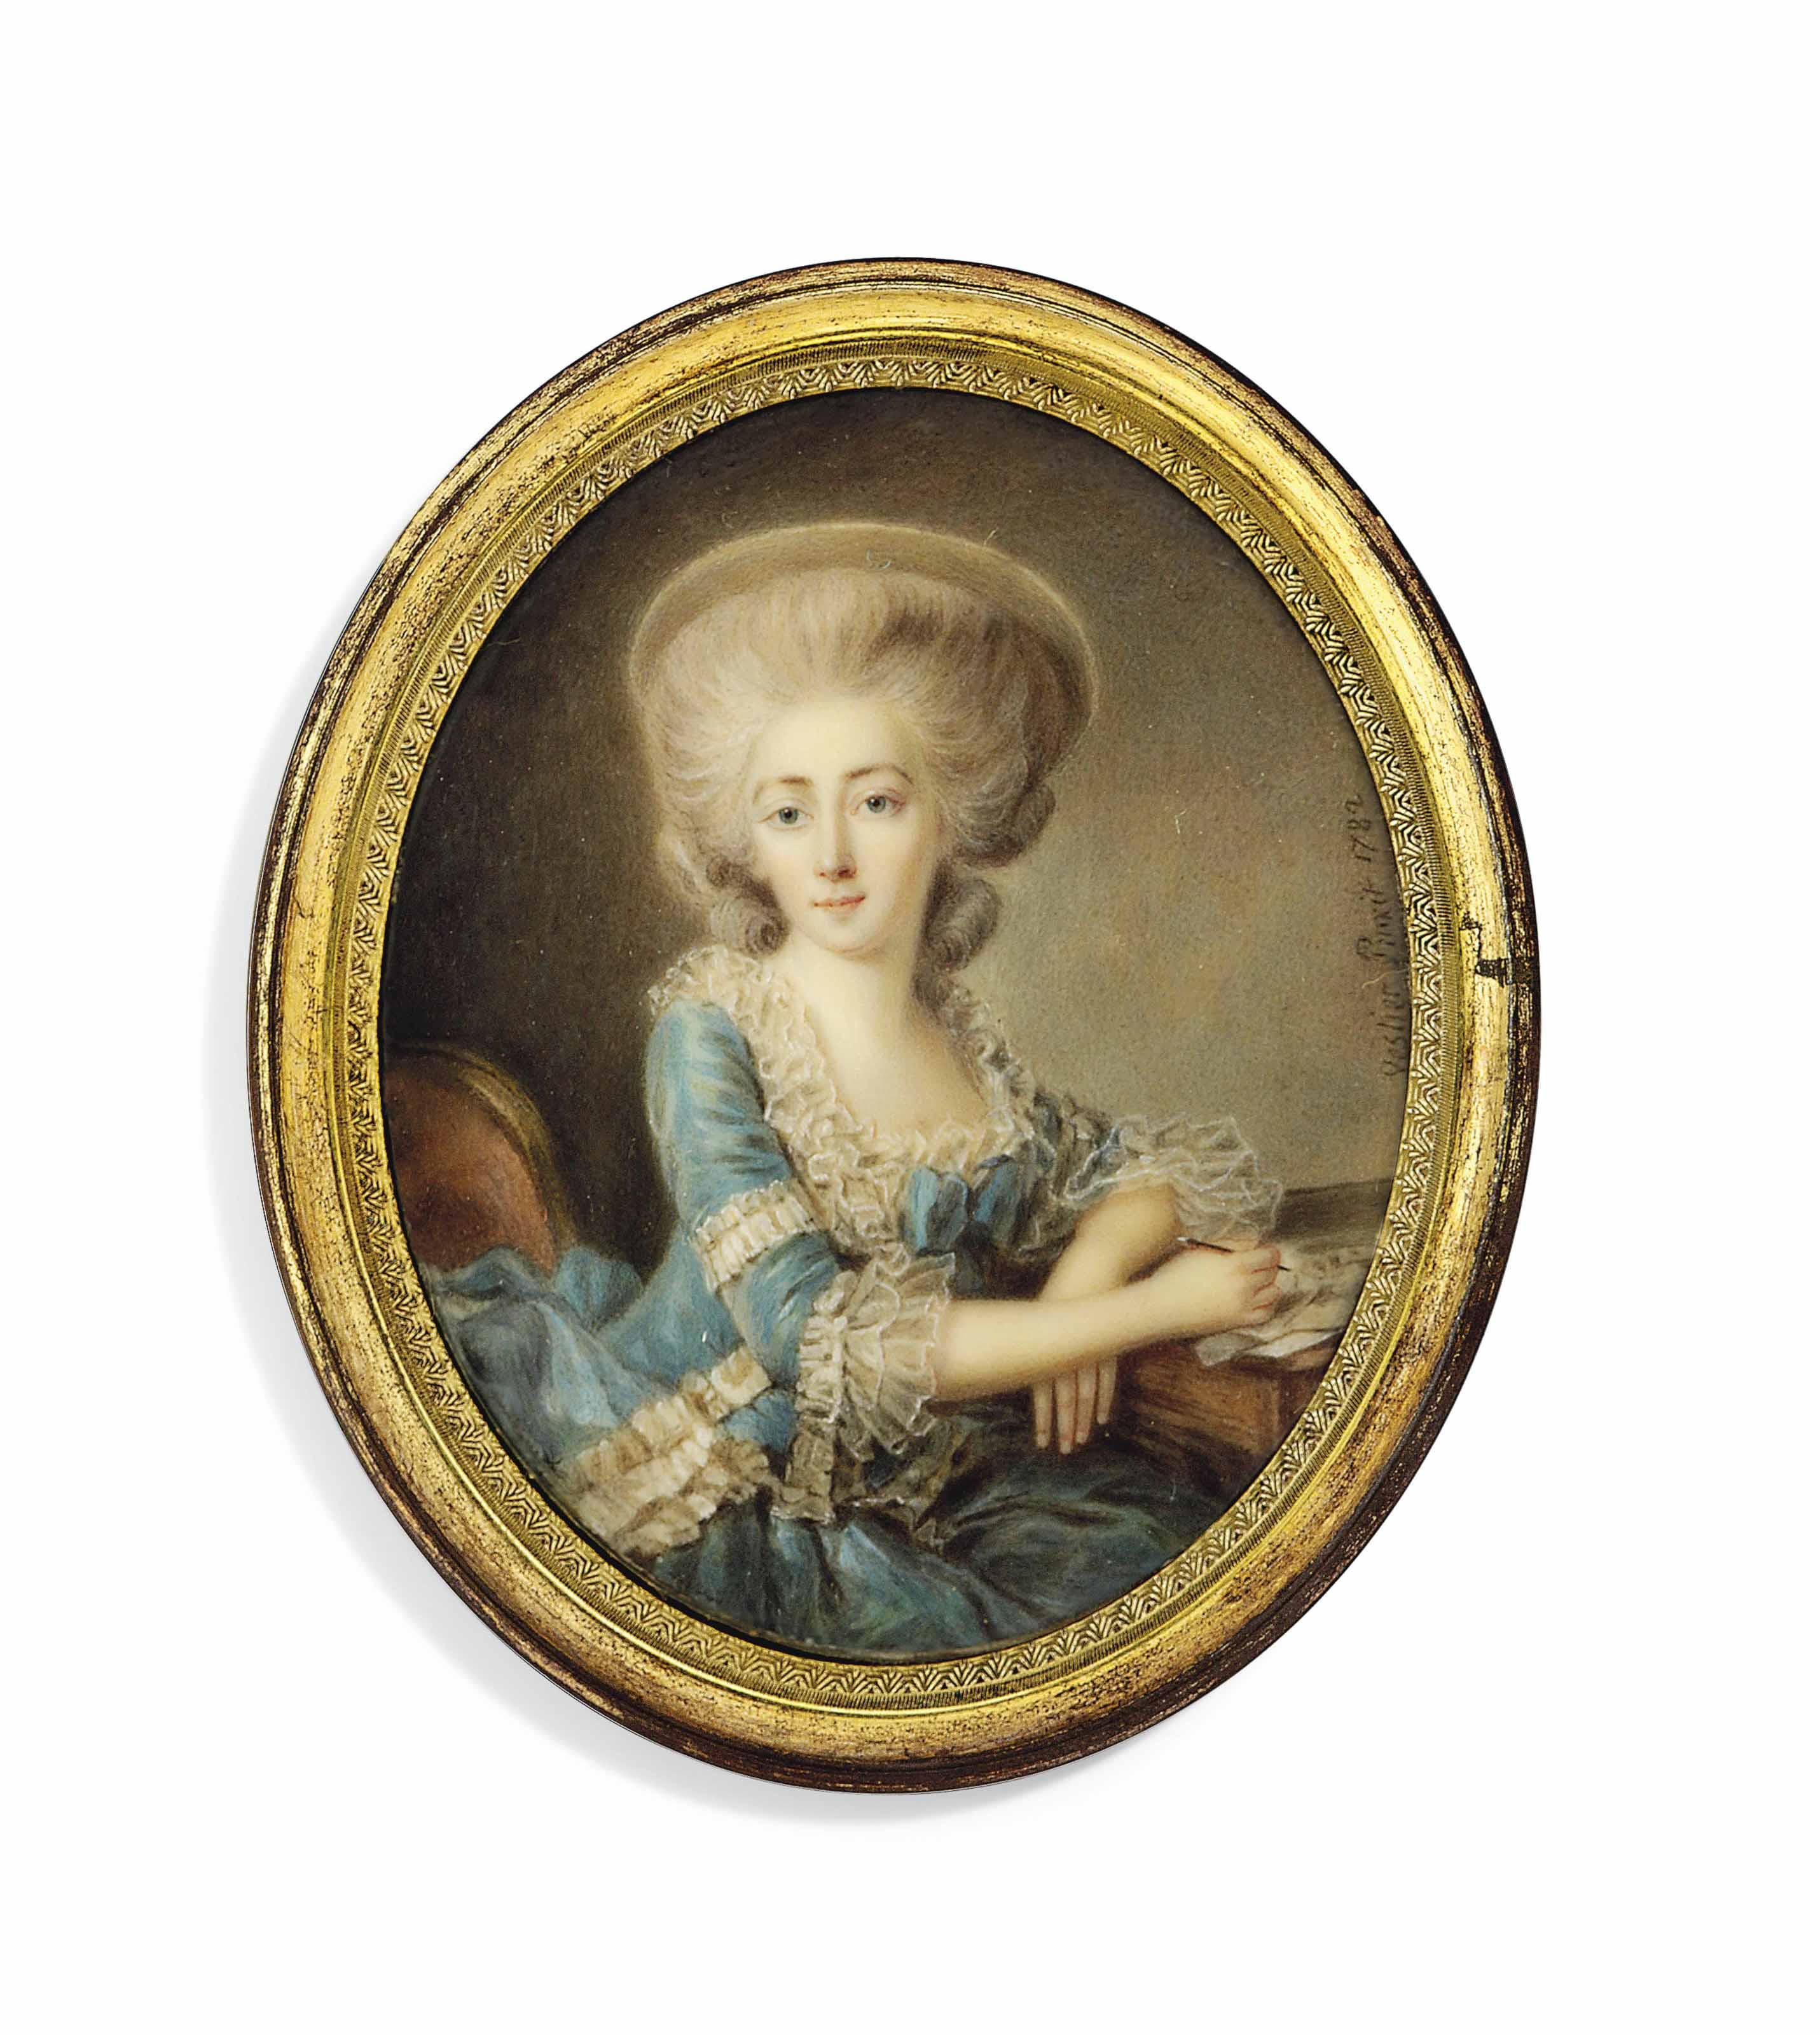 ANTOINE VESTIER (FRENCH, 1740-